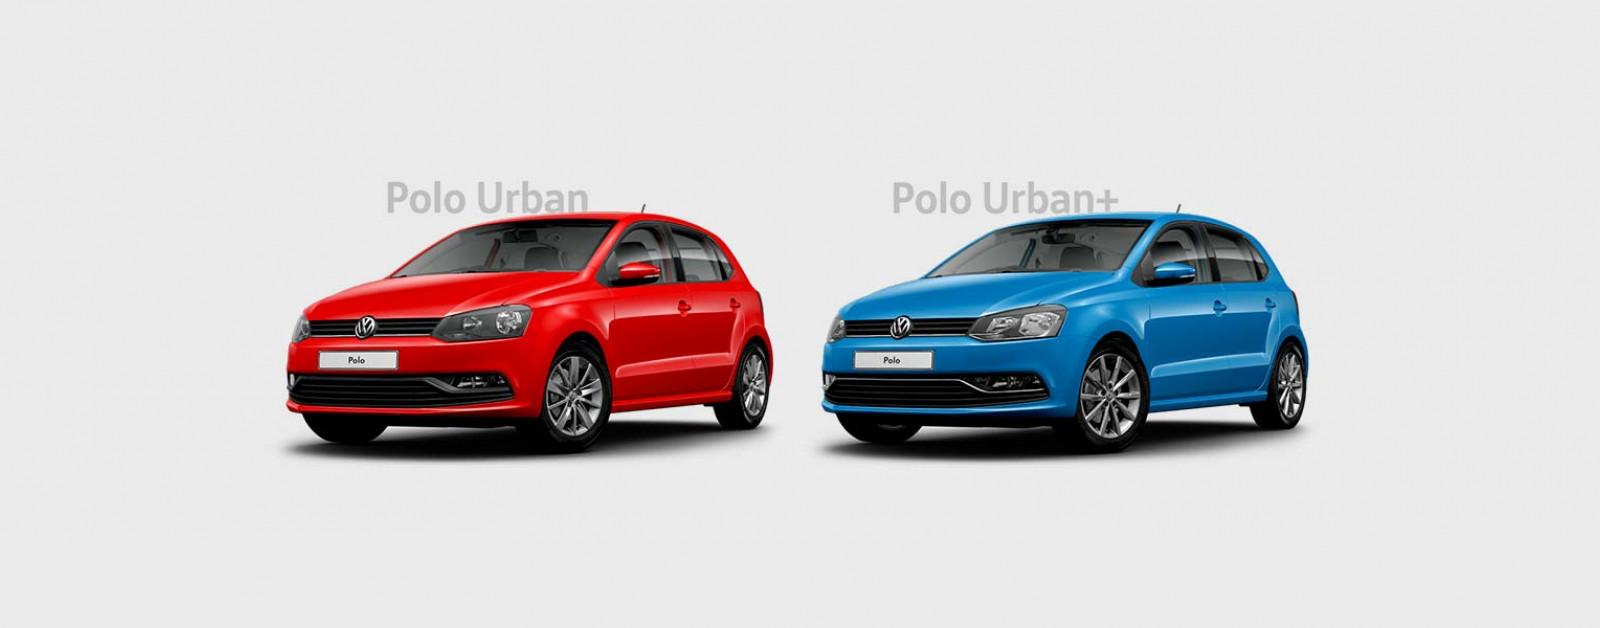 Volkswagen polo 2010 model araba resimleri - Polo Vehicles For Sale